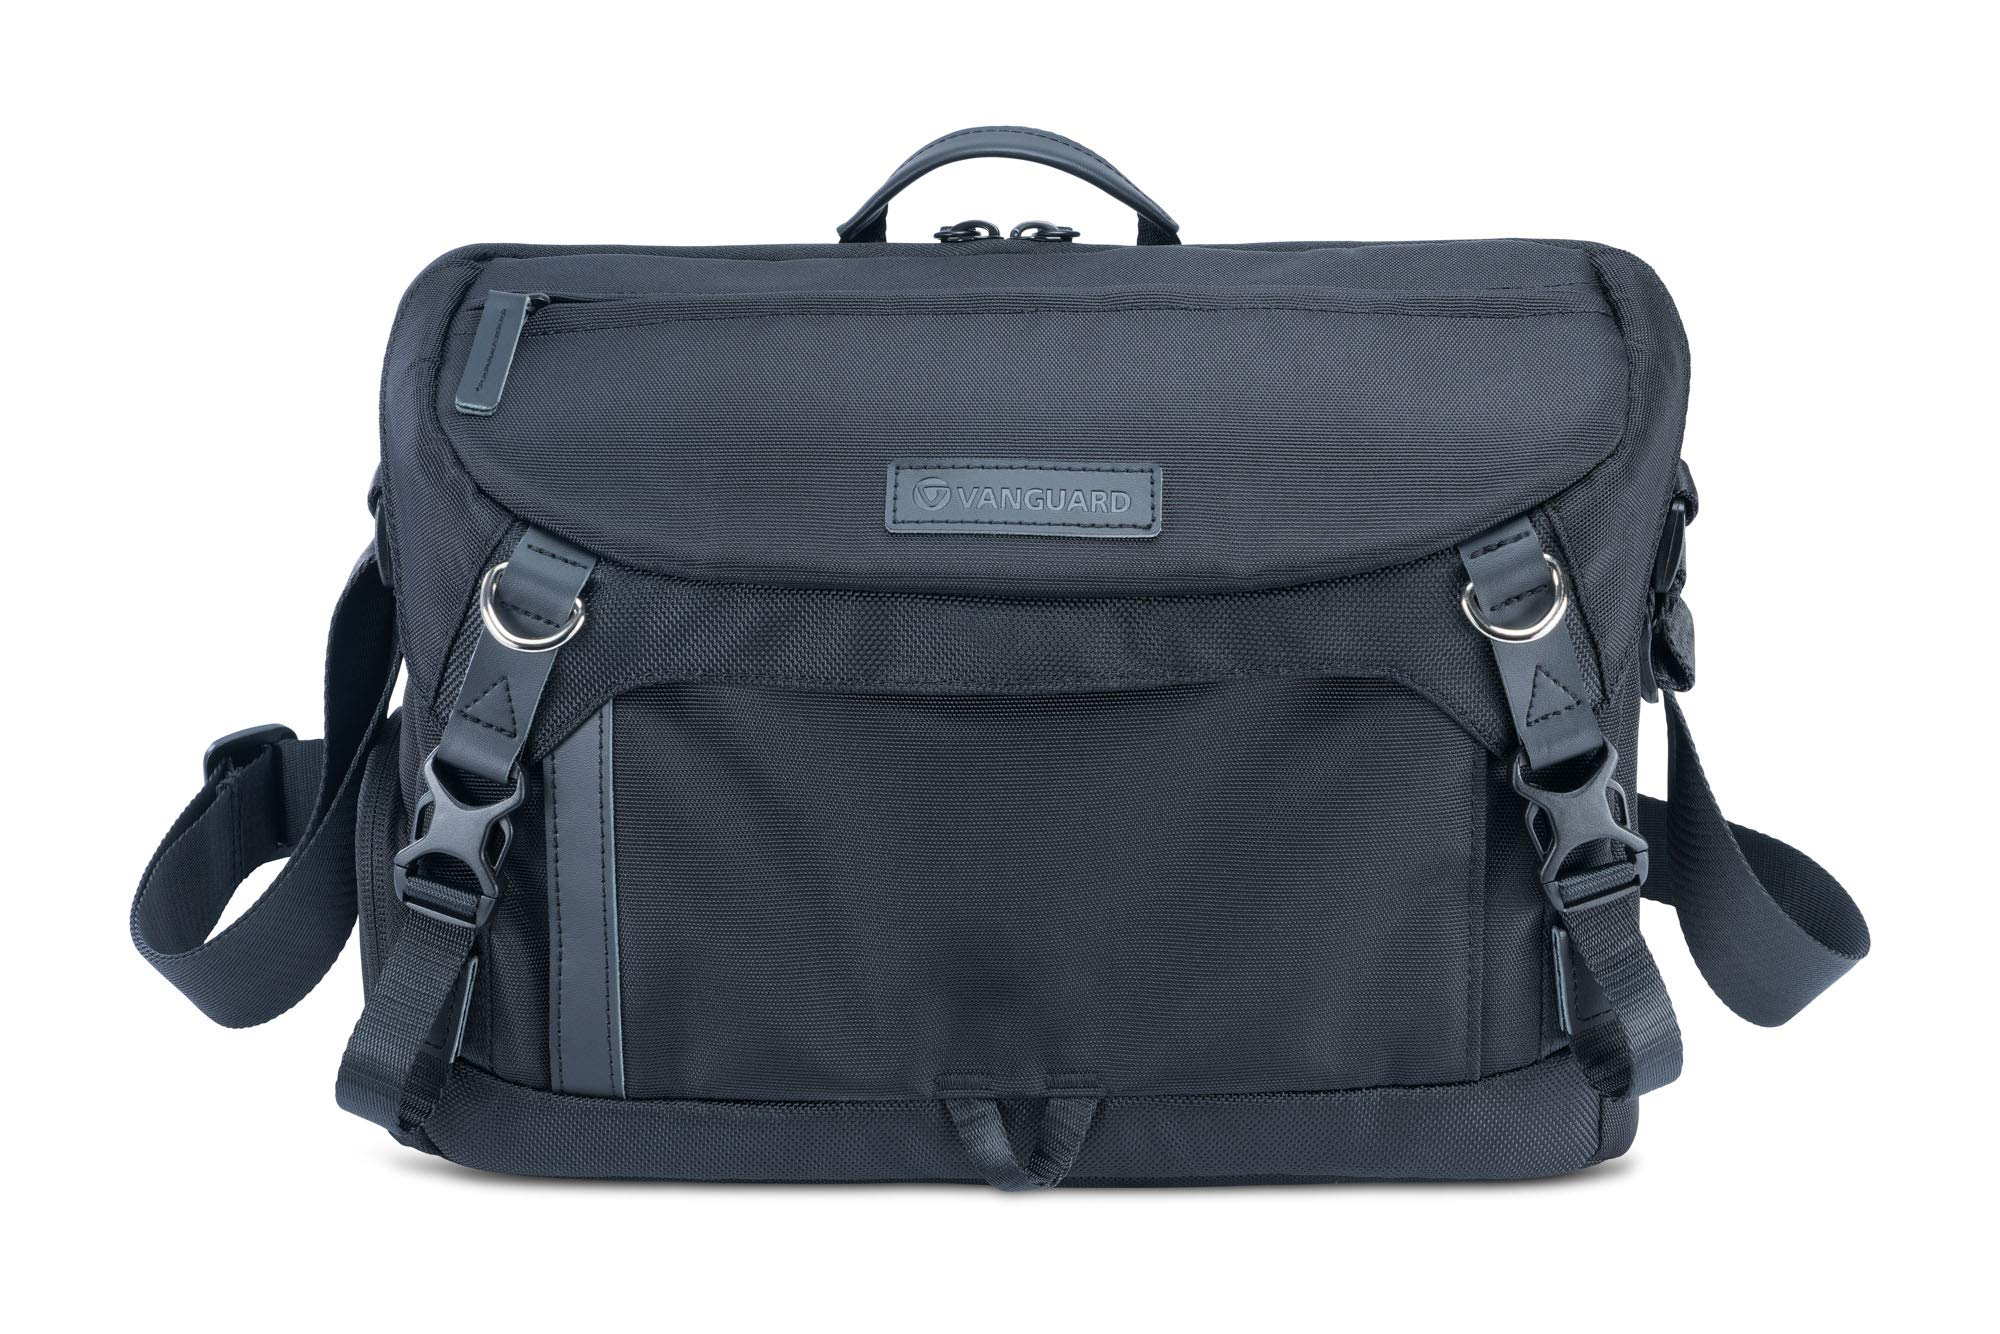 Veo 2GO 265AB Tripod Kit and Veo GO 34M BK Bag by Vanguard